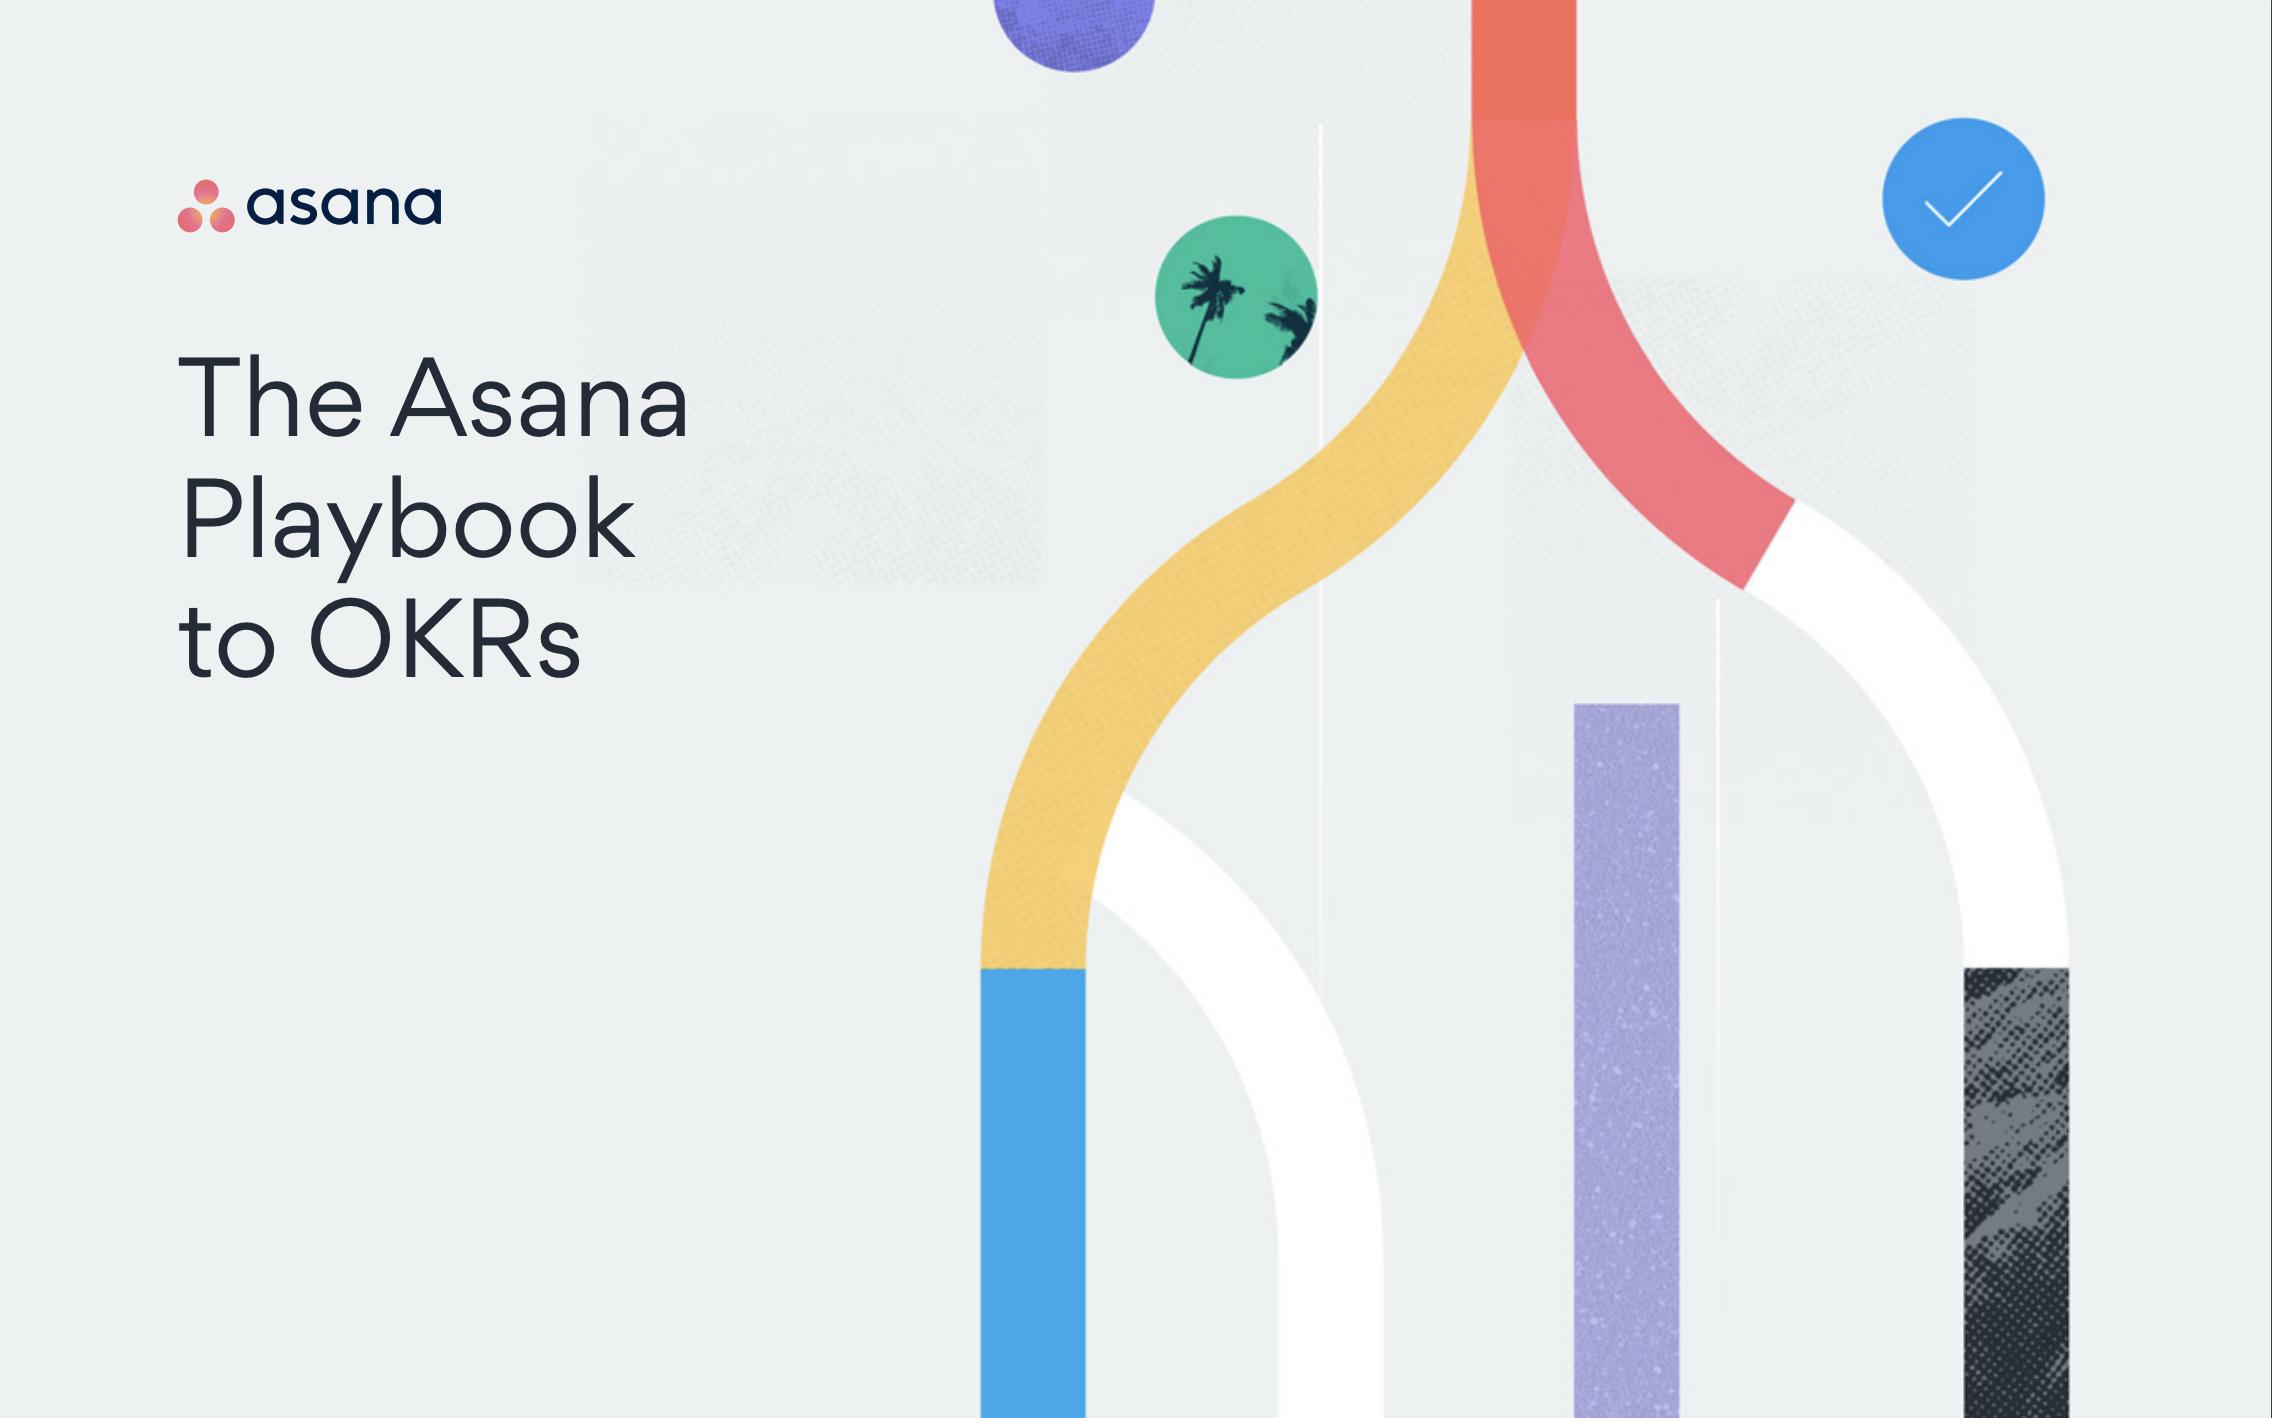 Asana - The Asana Playbook to OKRs Ebook - Cover